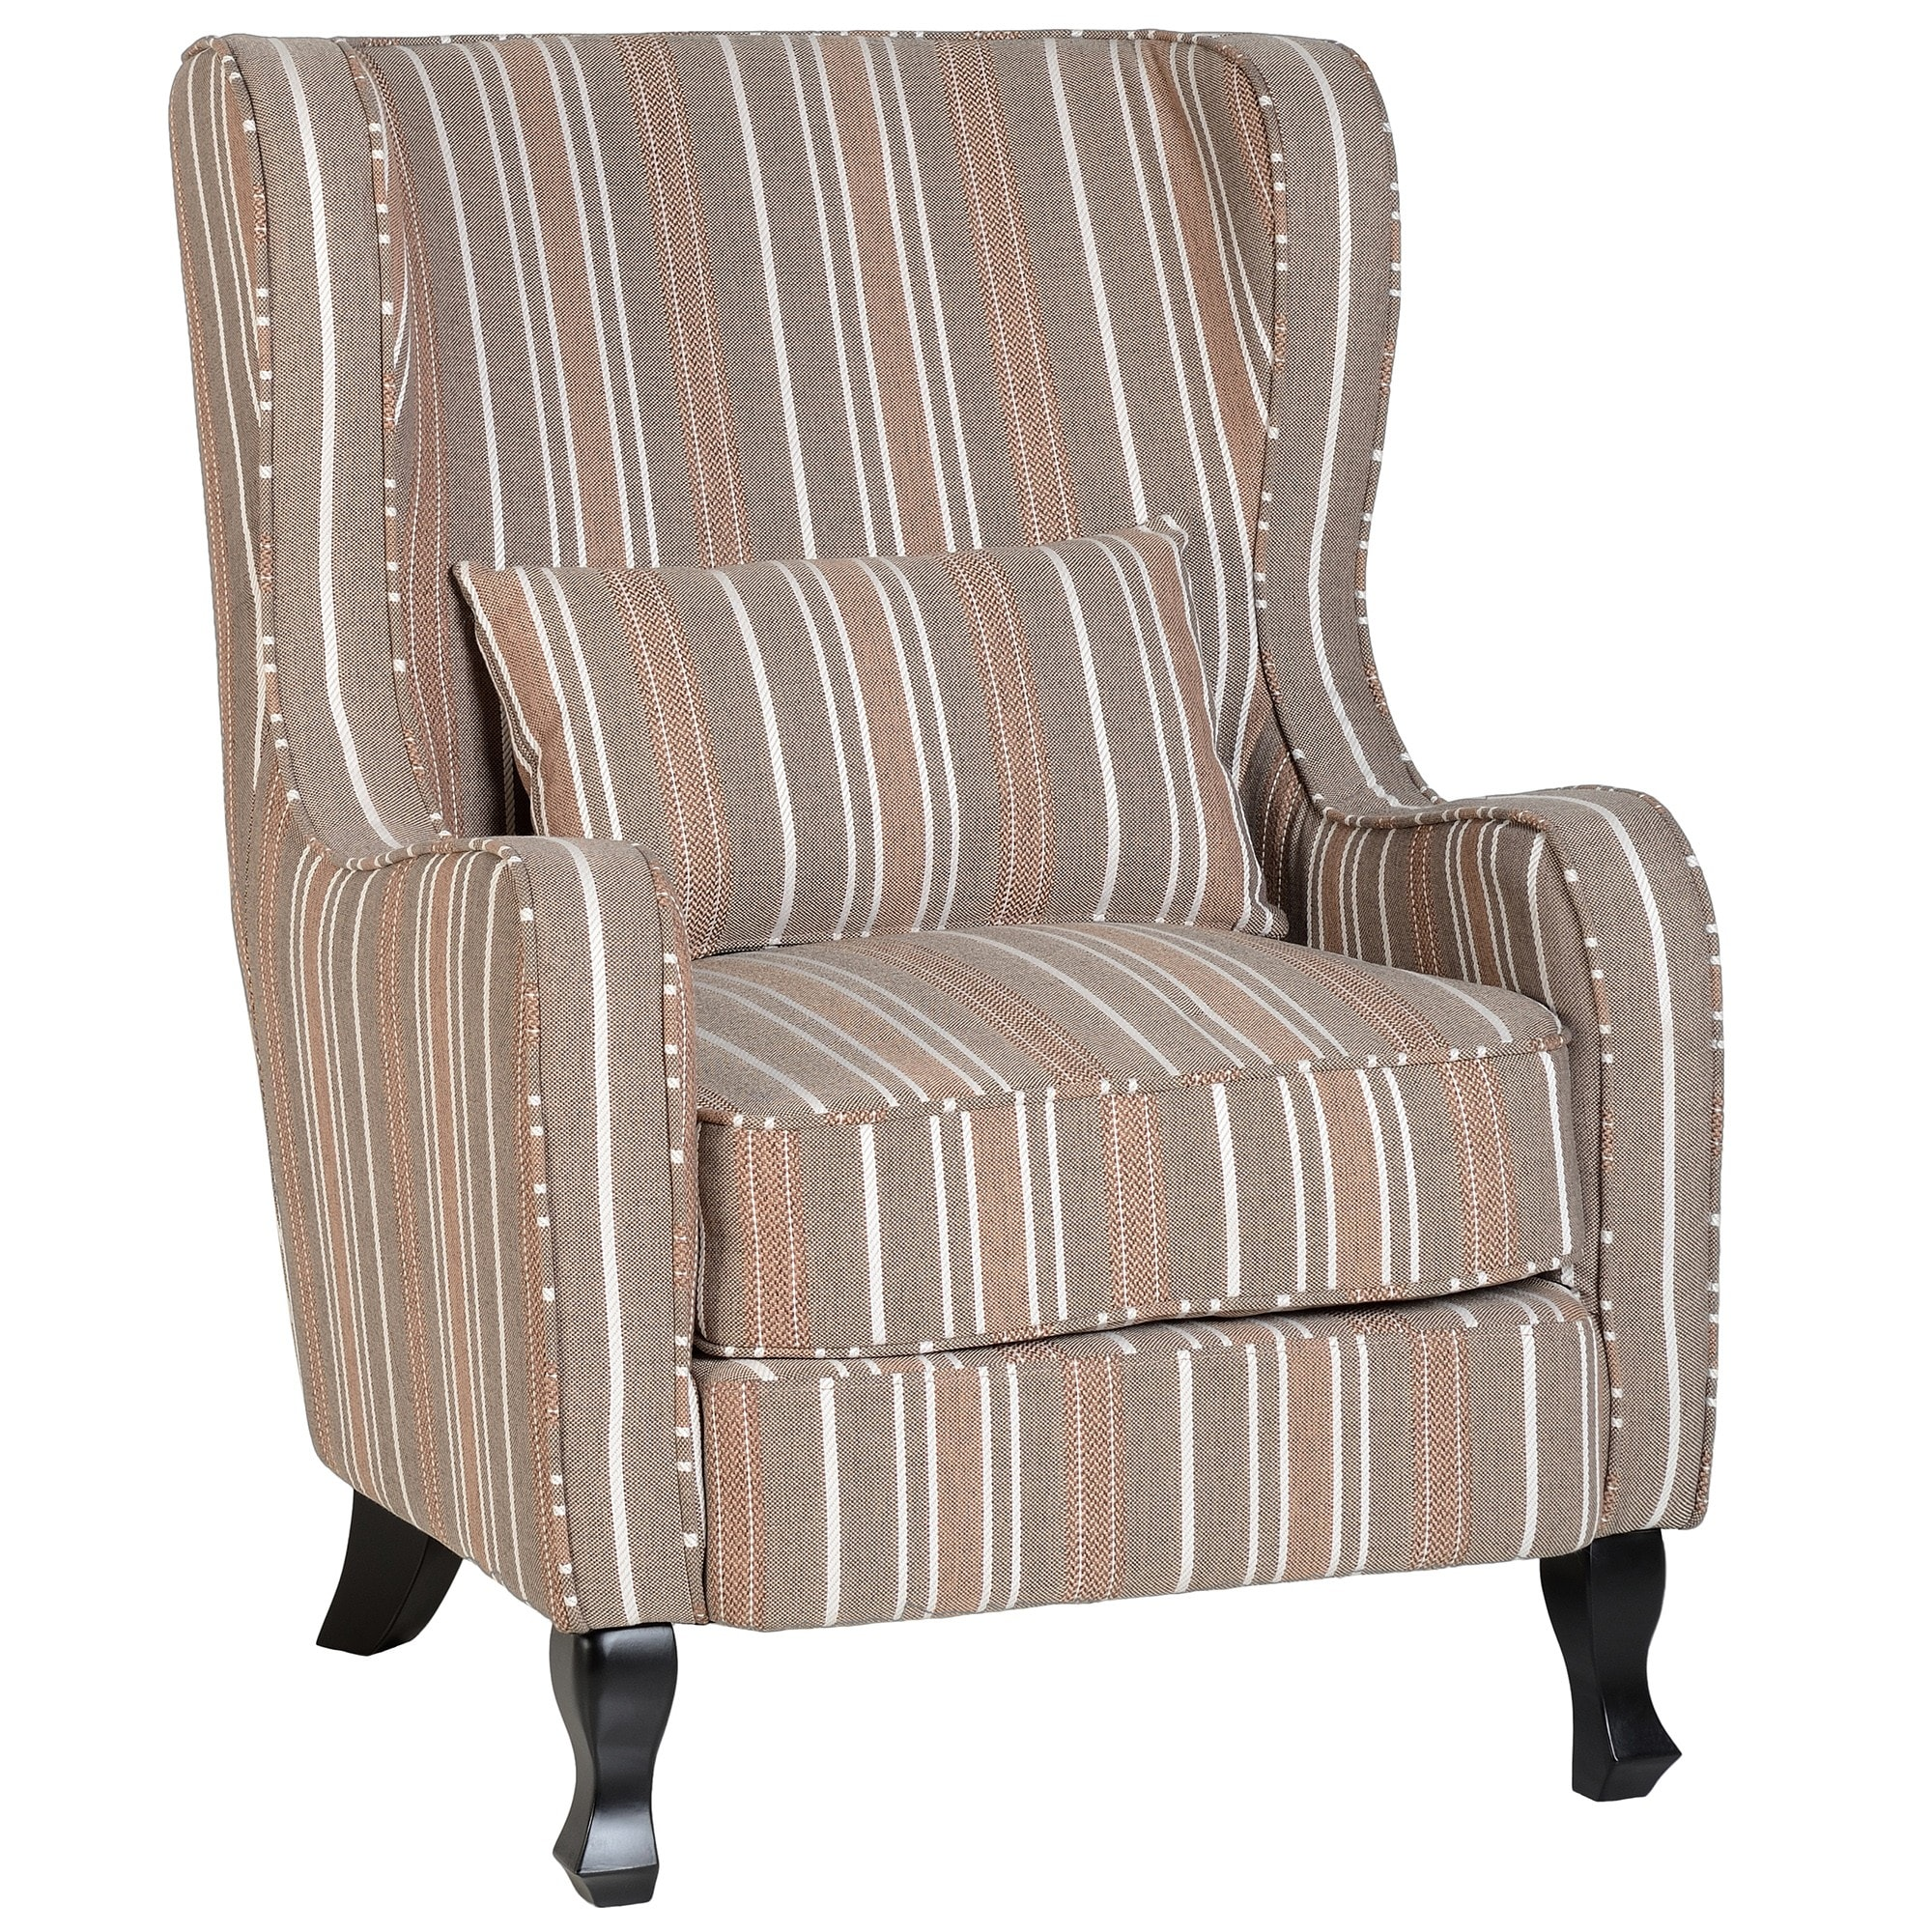 Sherborne Fireside Chair | Modern Furniture | Chairs